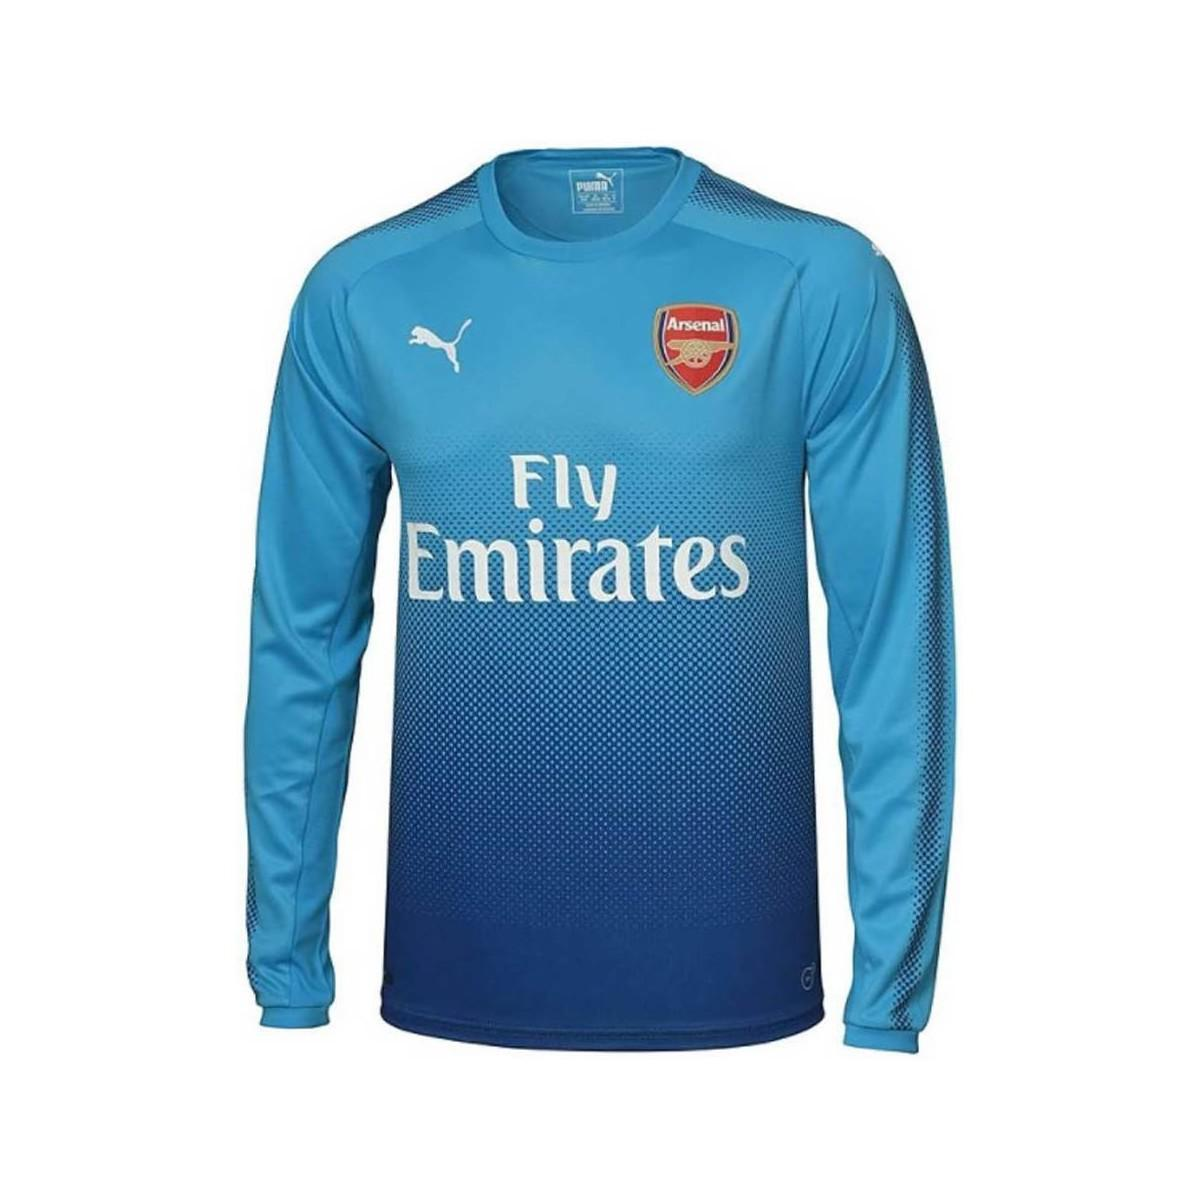 Puma 2017-2018 Arsenal Away Long Sleeve Shirt (wilshere 10) Men s In ... 0d7e7db10